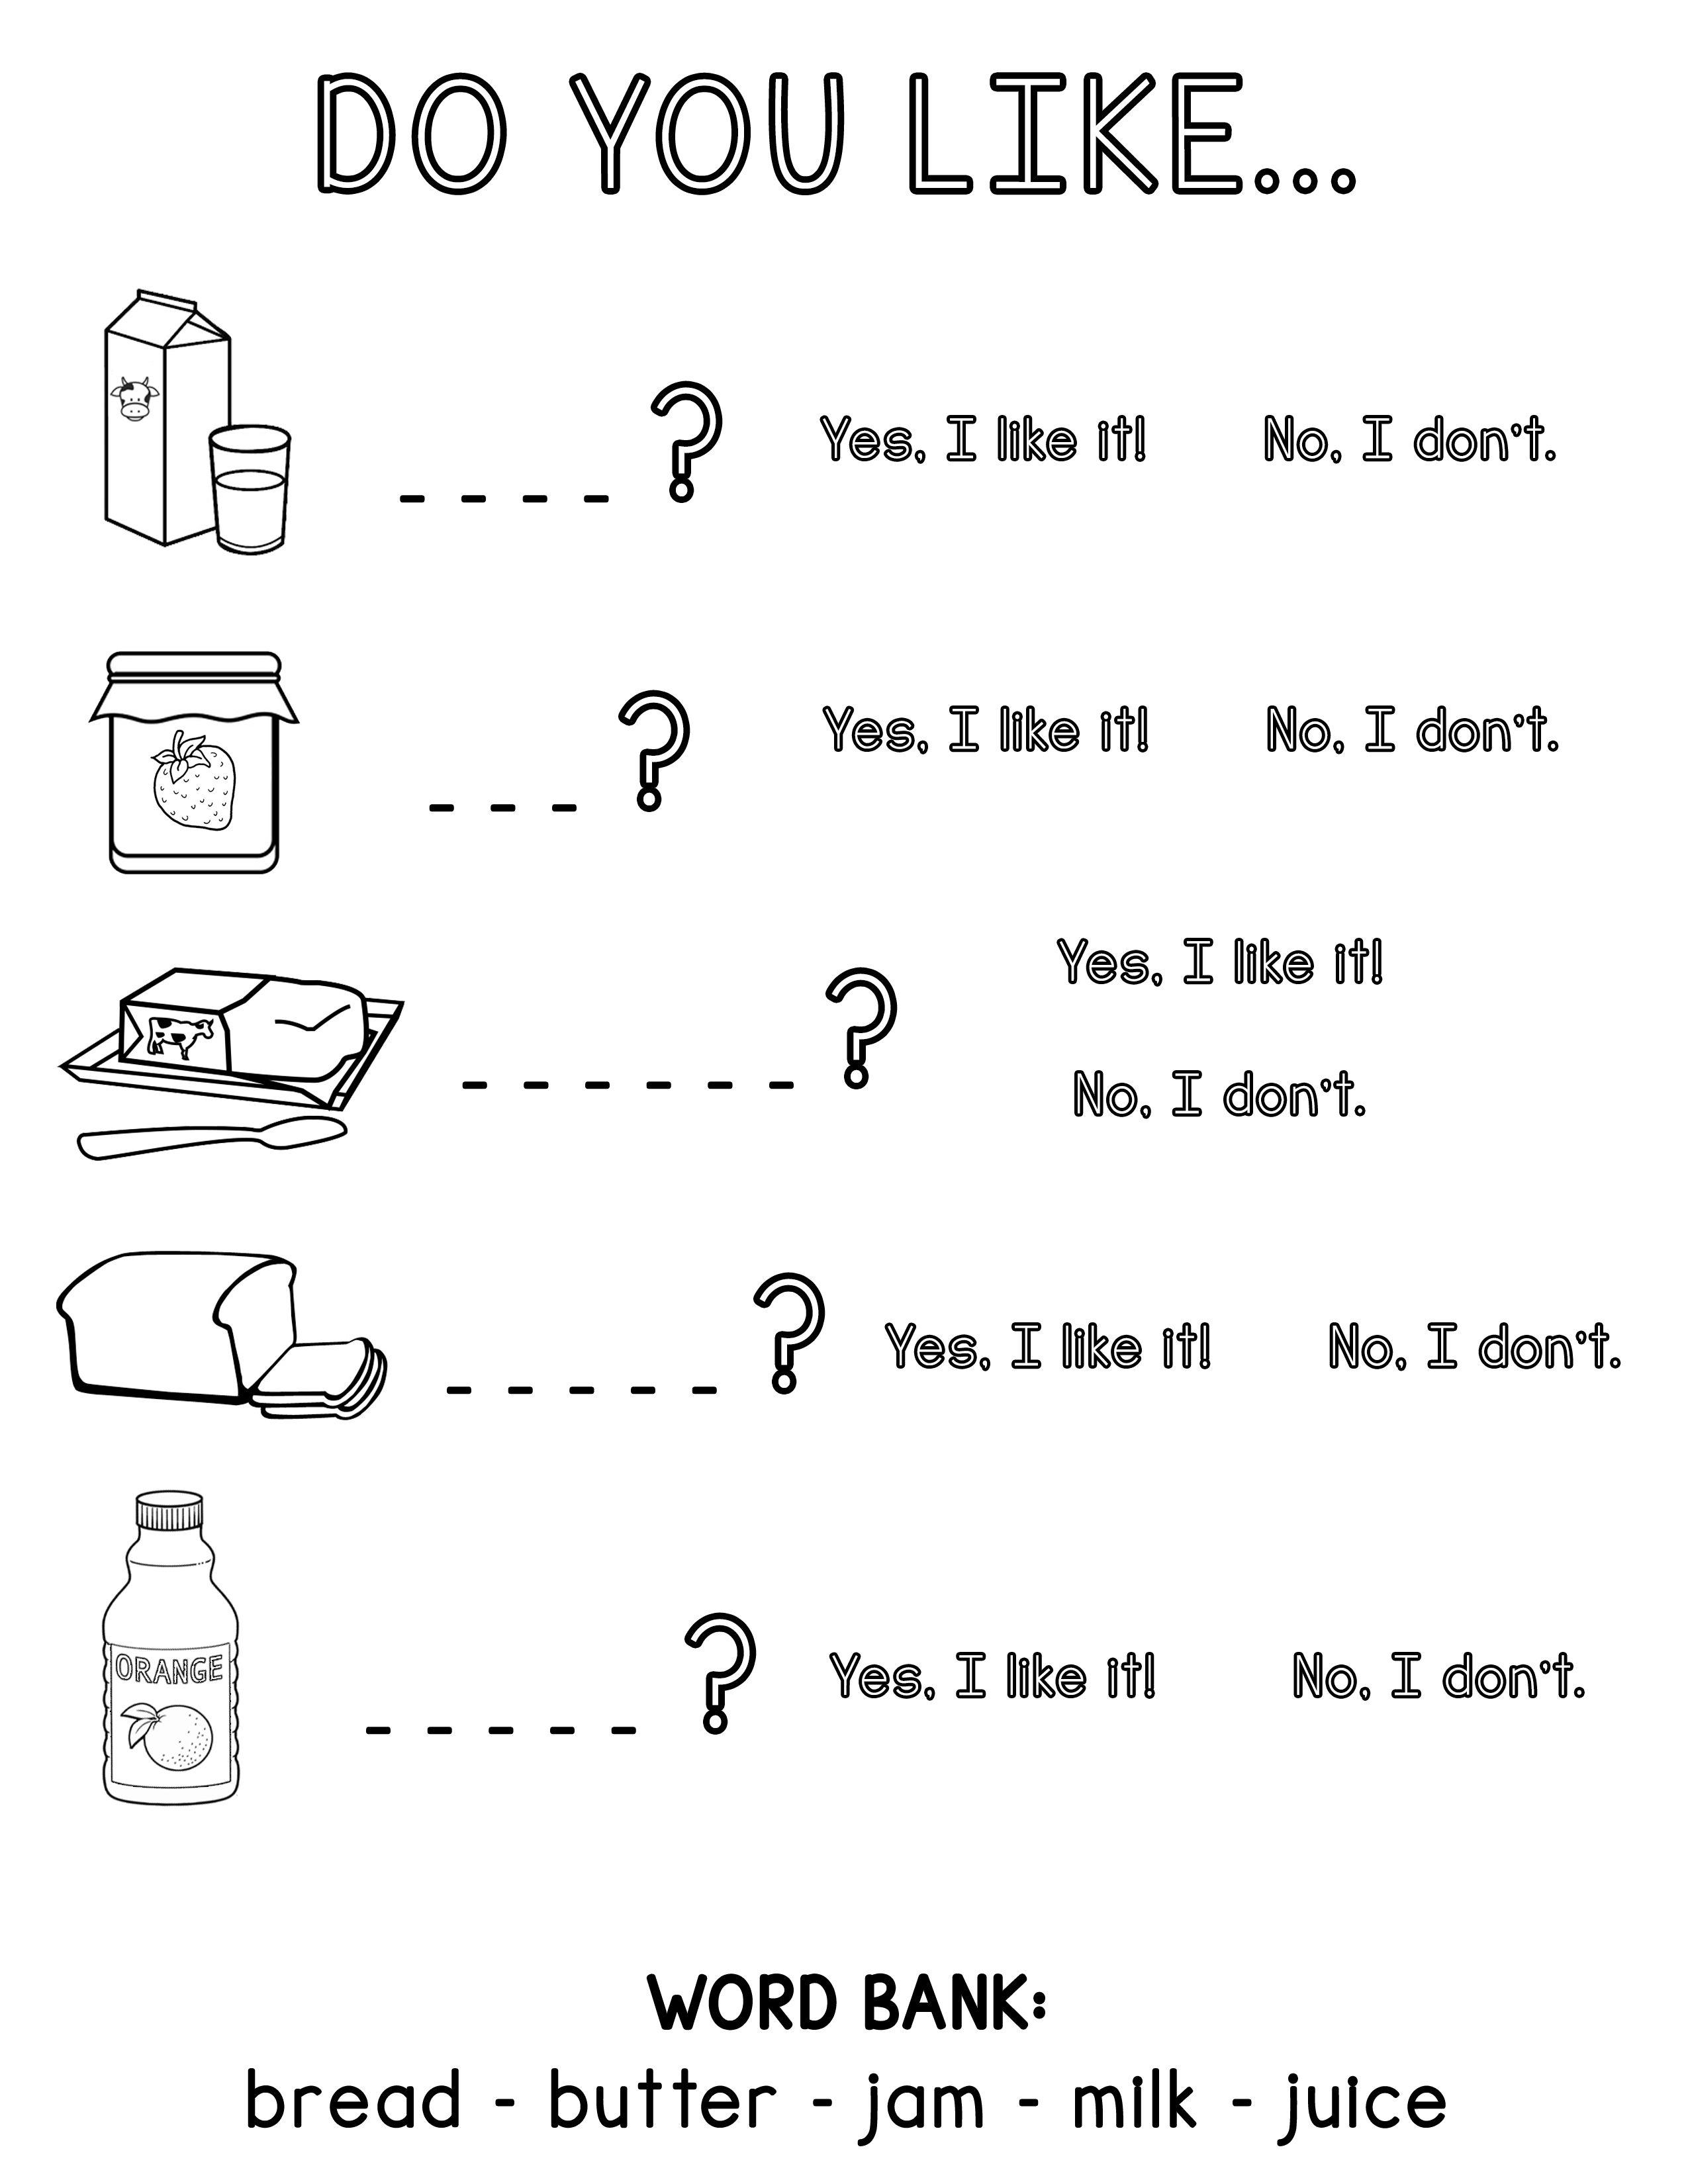 Breakfast Time Worksheet English Worksheets For Kids Time Worksheets First Grade Worksheets [ 3300 x 2550 Pixel ]